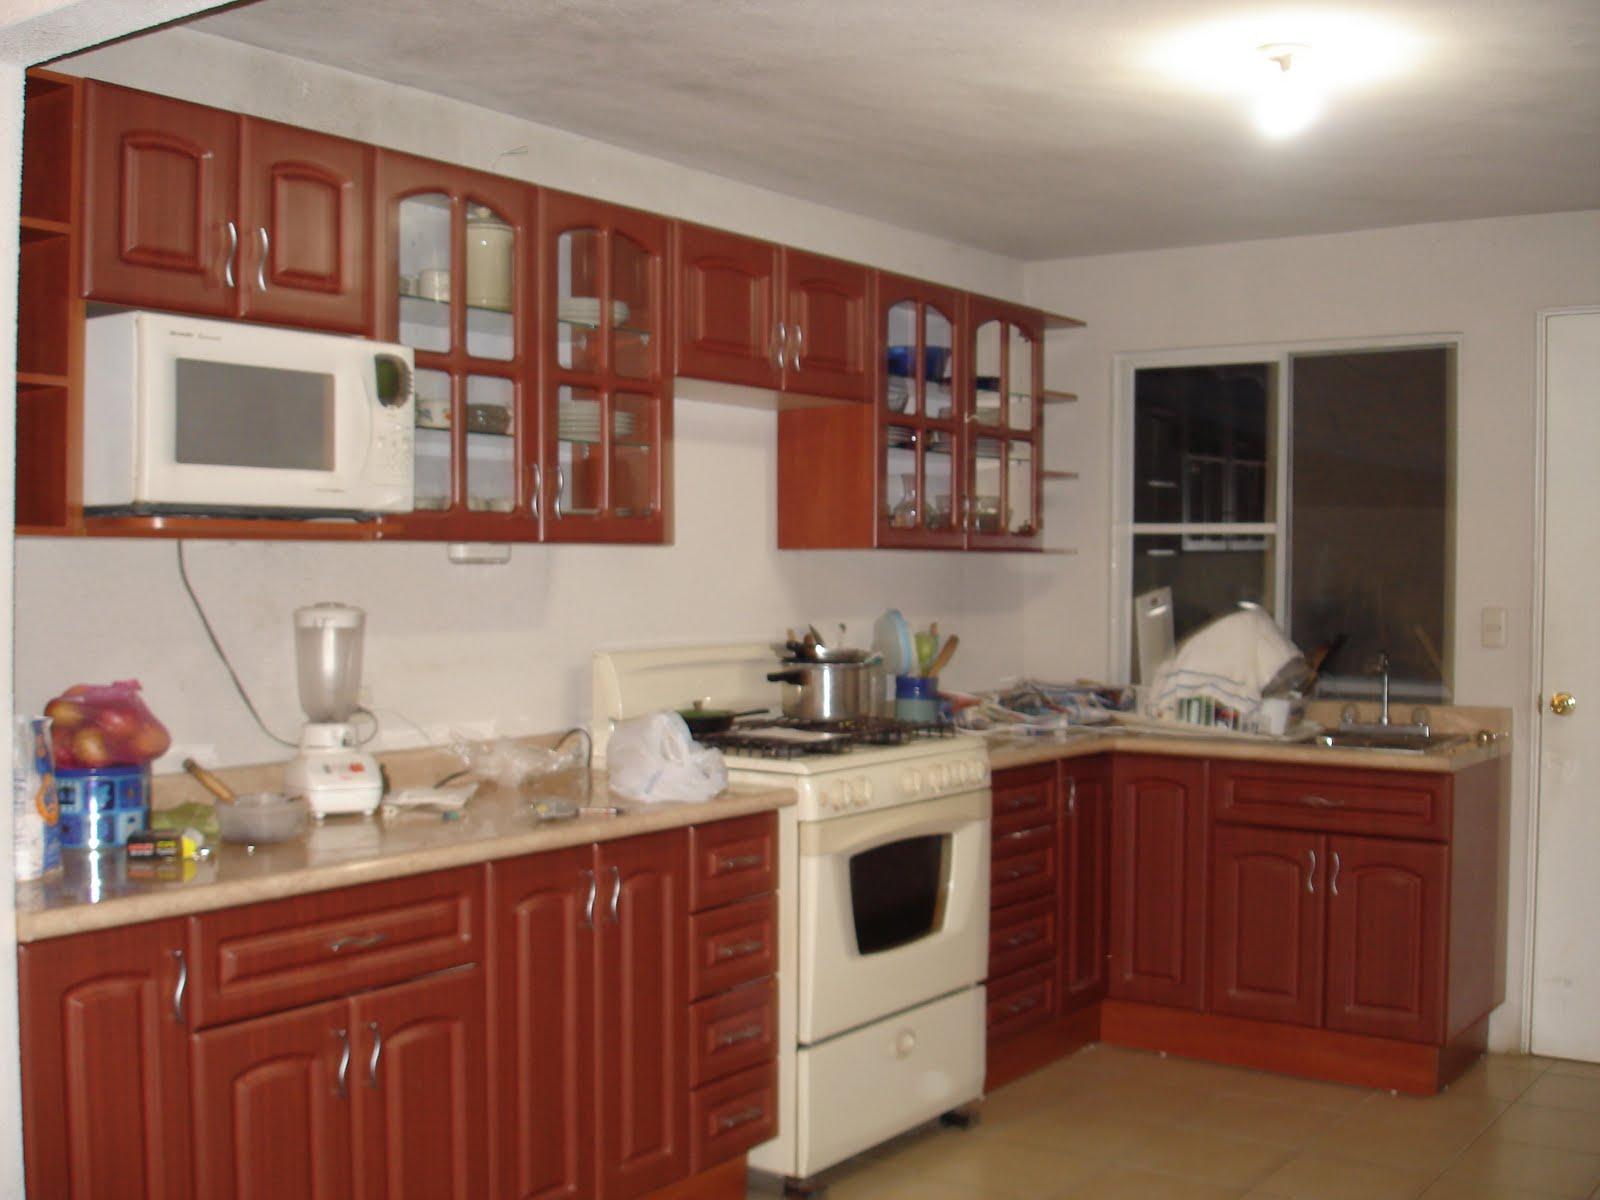 Construteksa gabinetes de cocina for Disenos de gabinetes de cocina